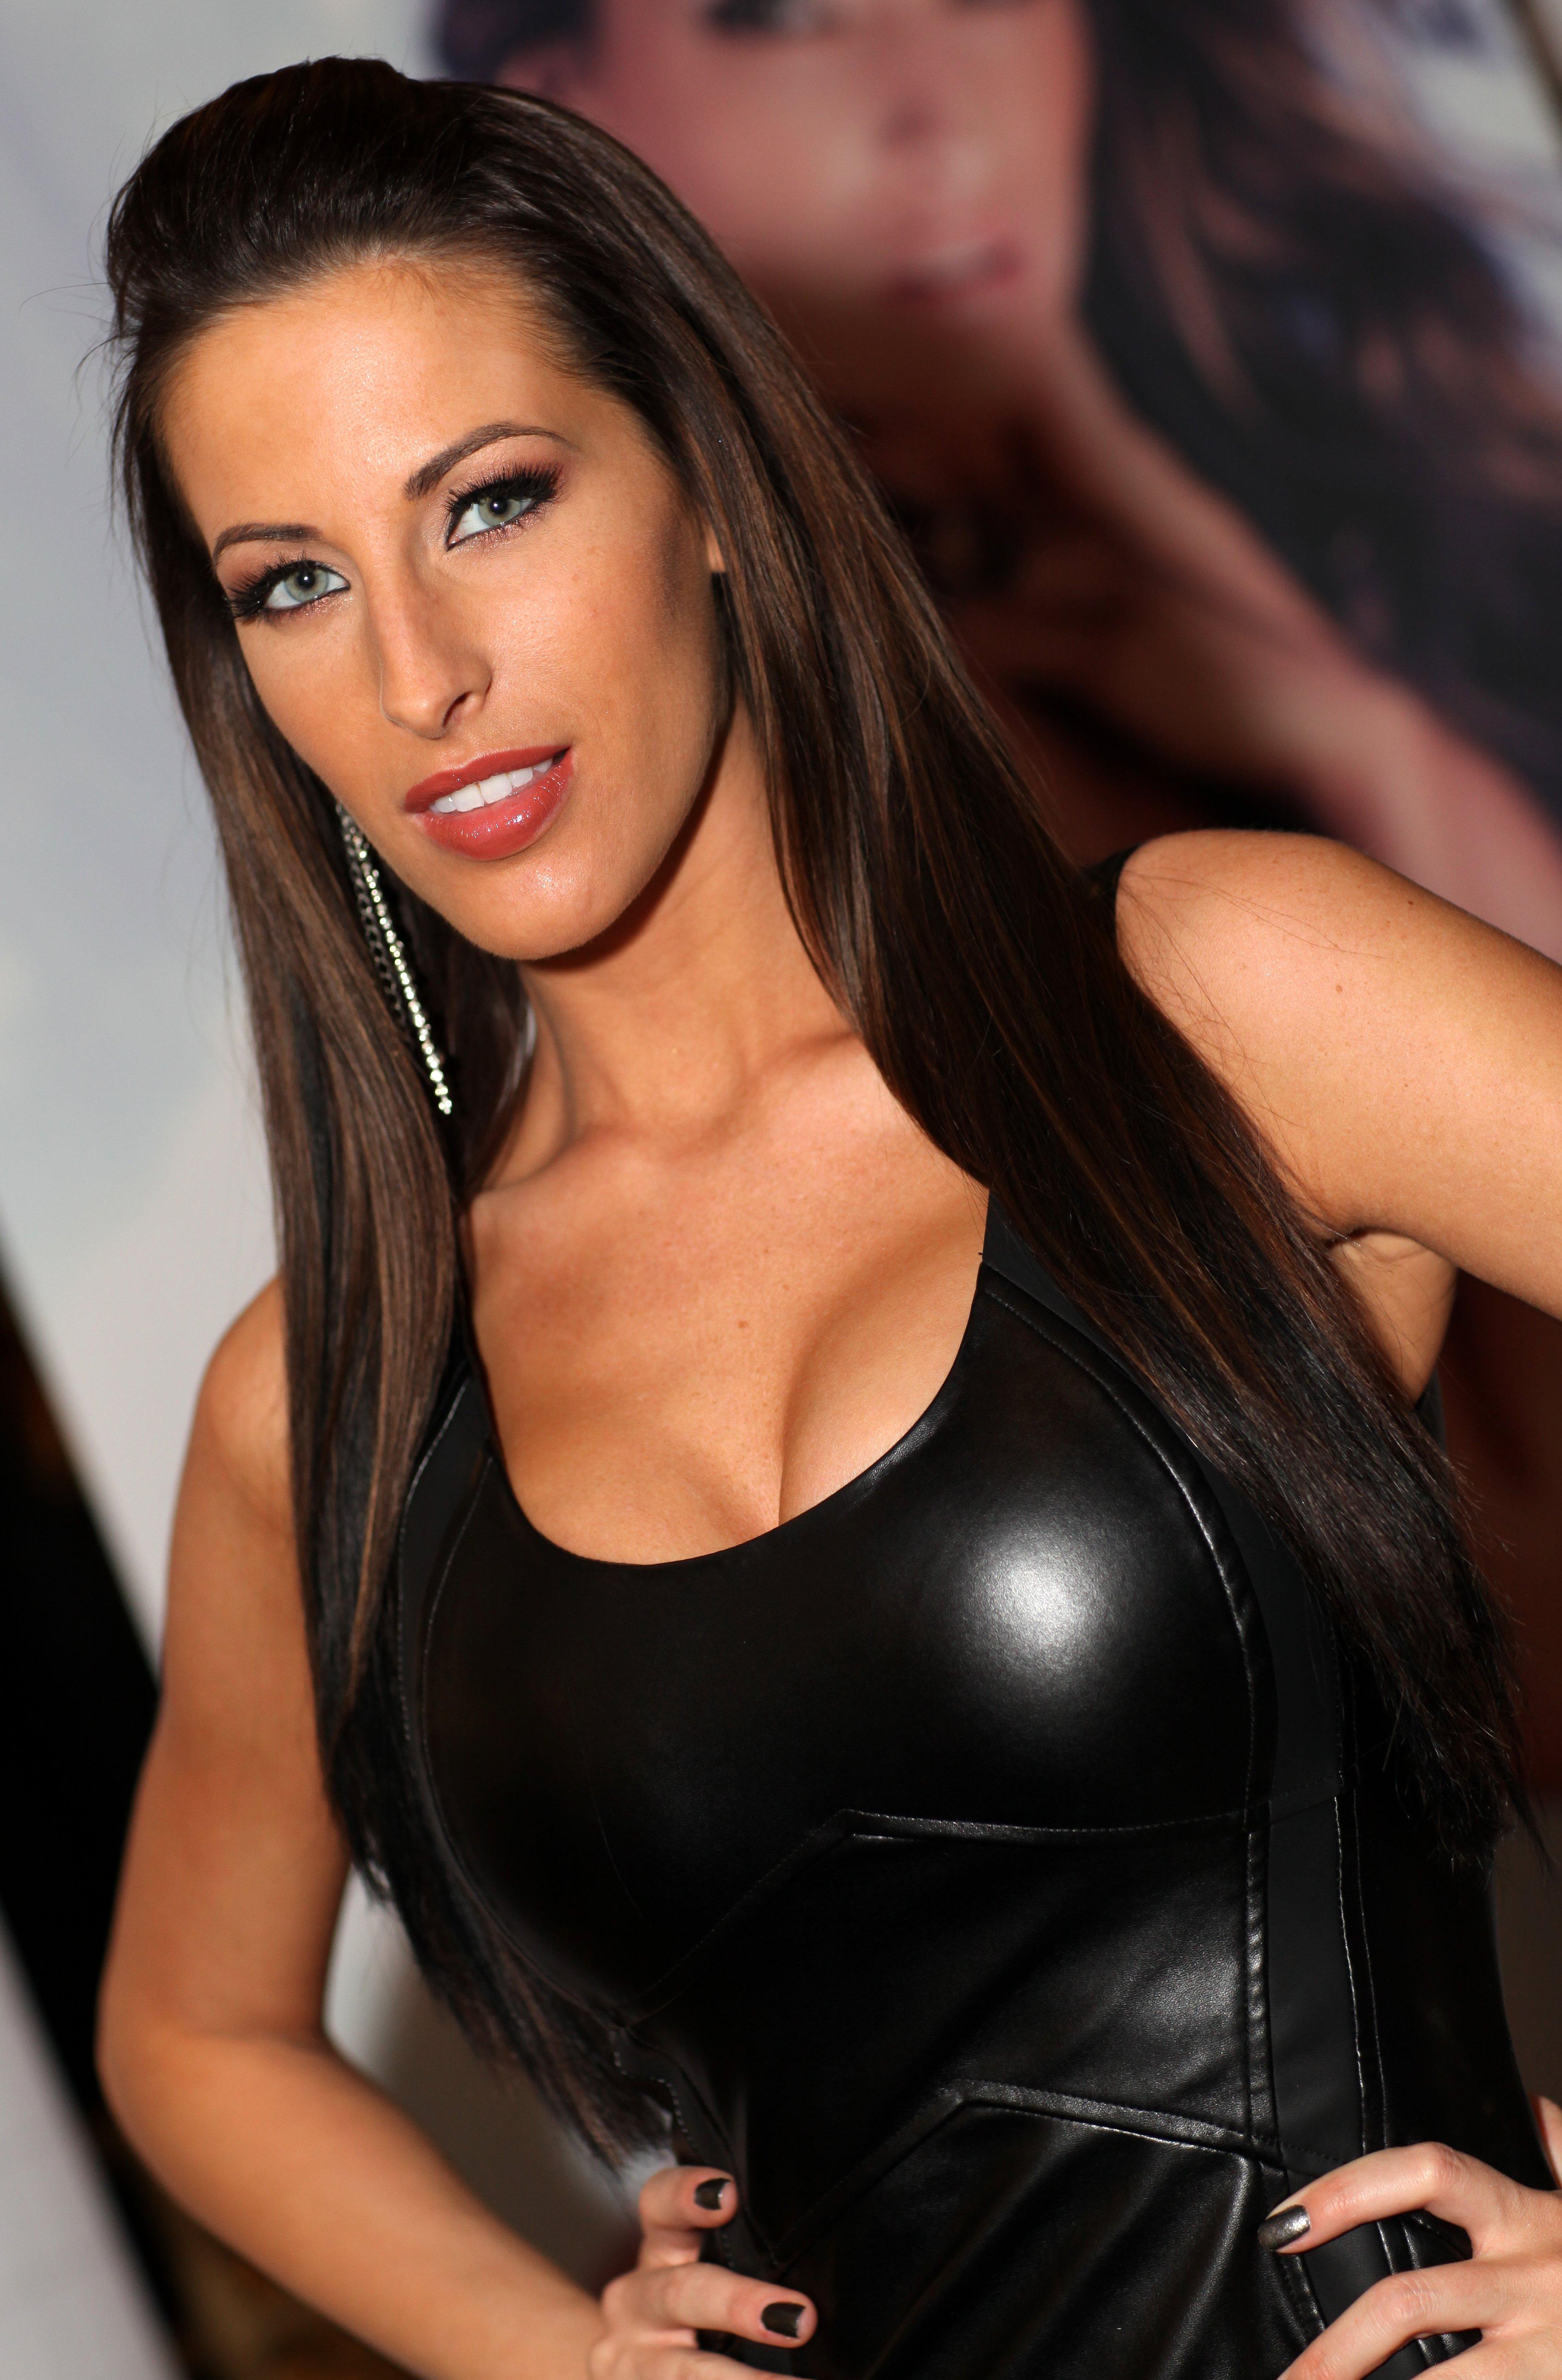 Capri cavanni hottest nude pornstar pics xxx something disgusting